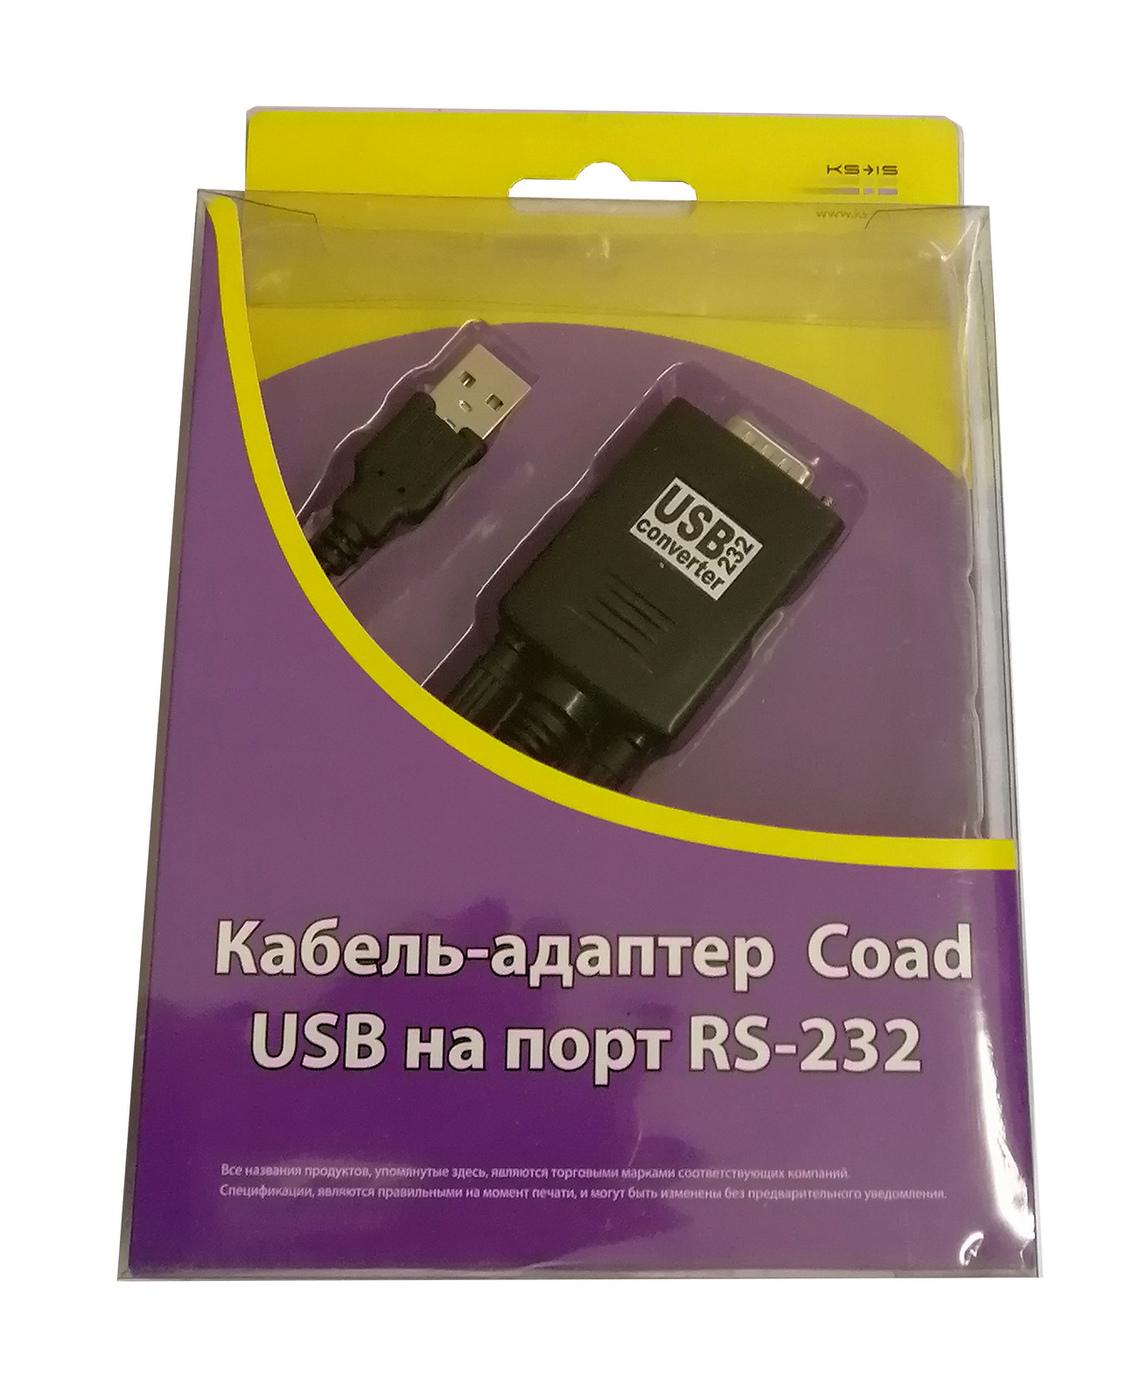 Адаптер USB на порт COM (RS-232) KS-is Coad (KS-012)